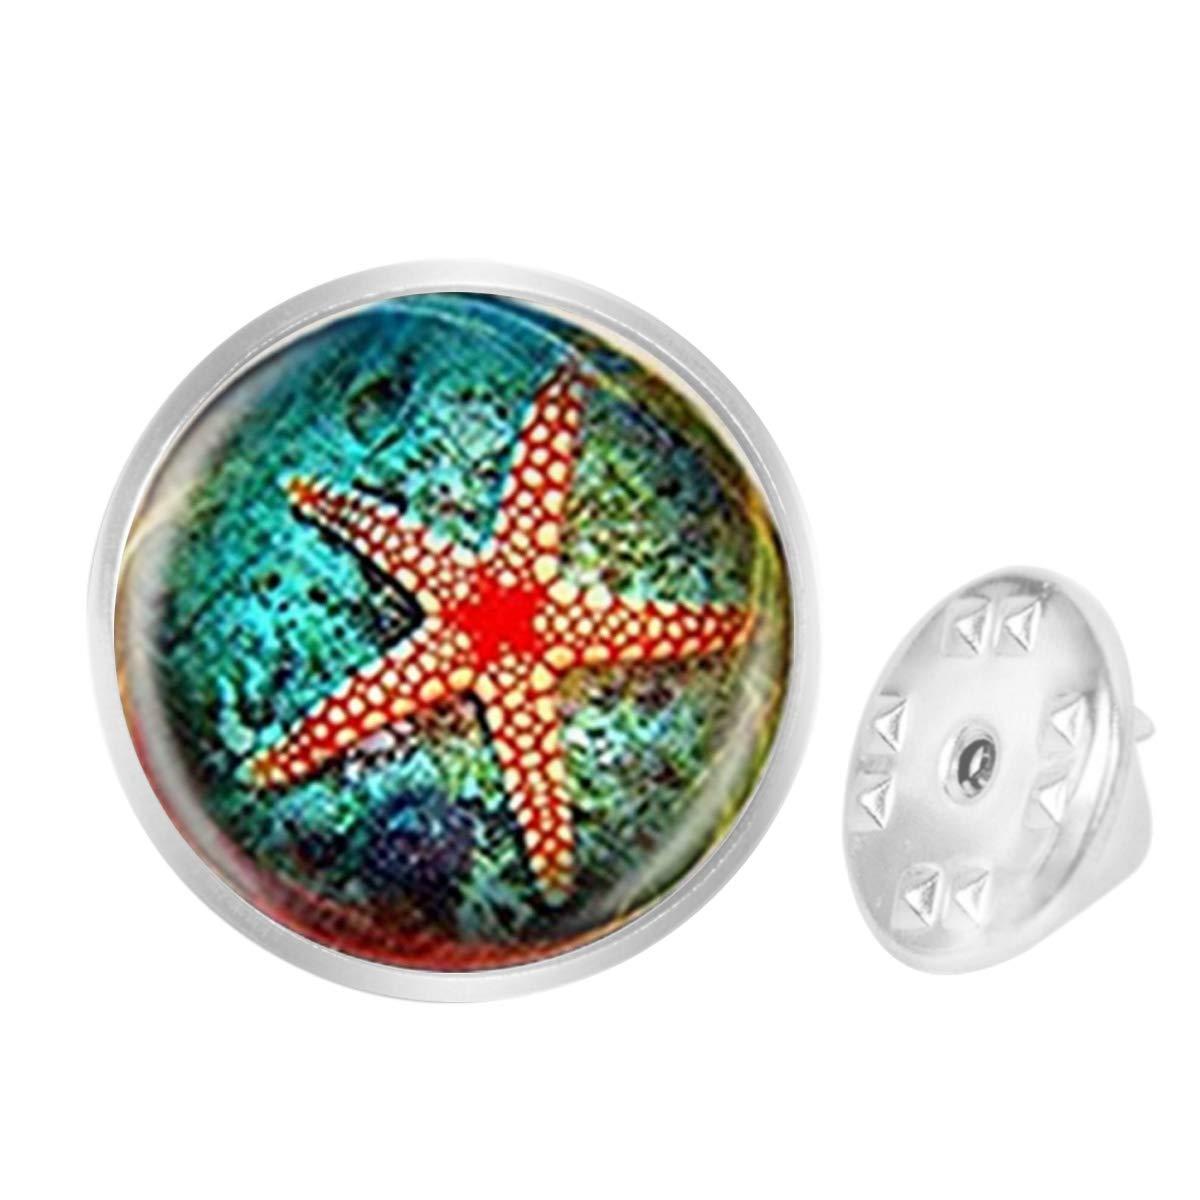 WAZZIT Round Metal Tie Tack Hat Lapel Pin Brooches Funny Sea World Starfish Banquet Badge Enamel Pins Trendy Accessory Jacket T-Shirt